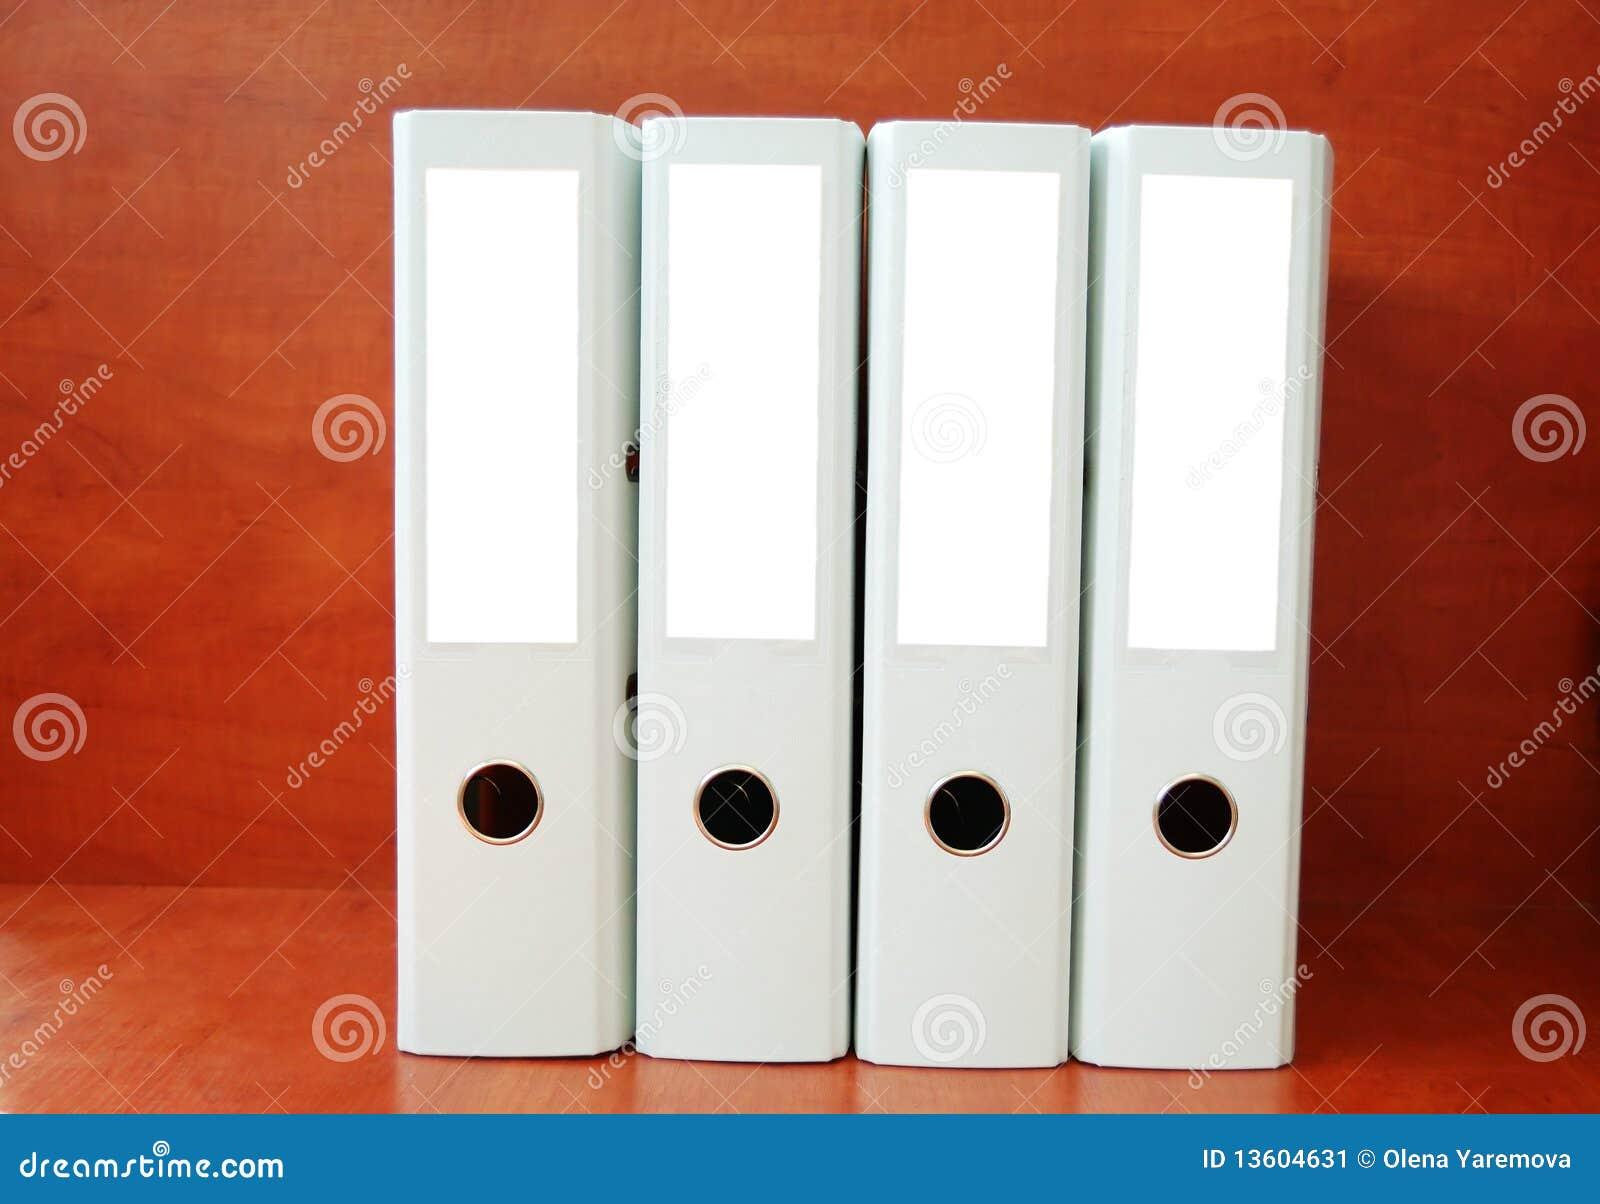 Office Folders Stock Image - Image: 13604631